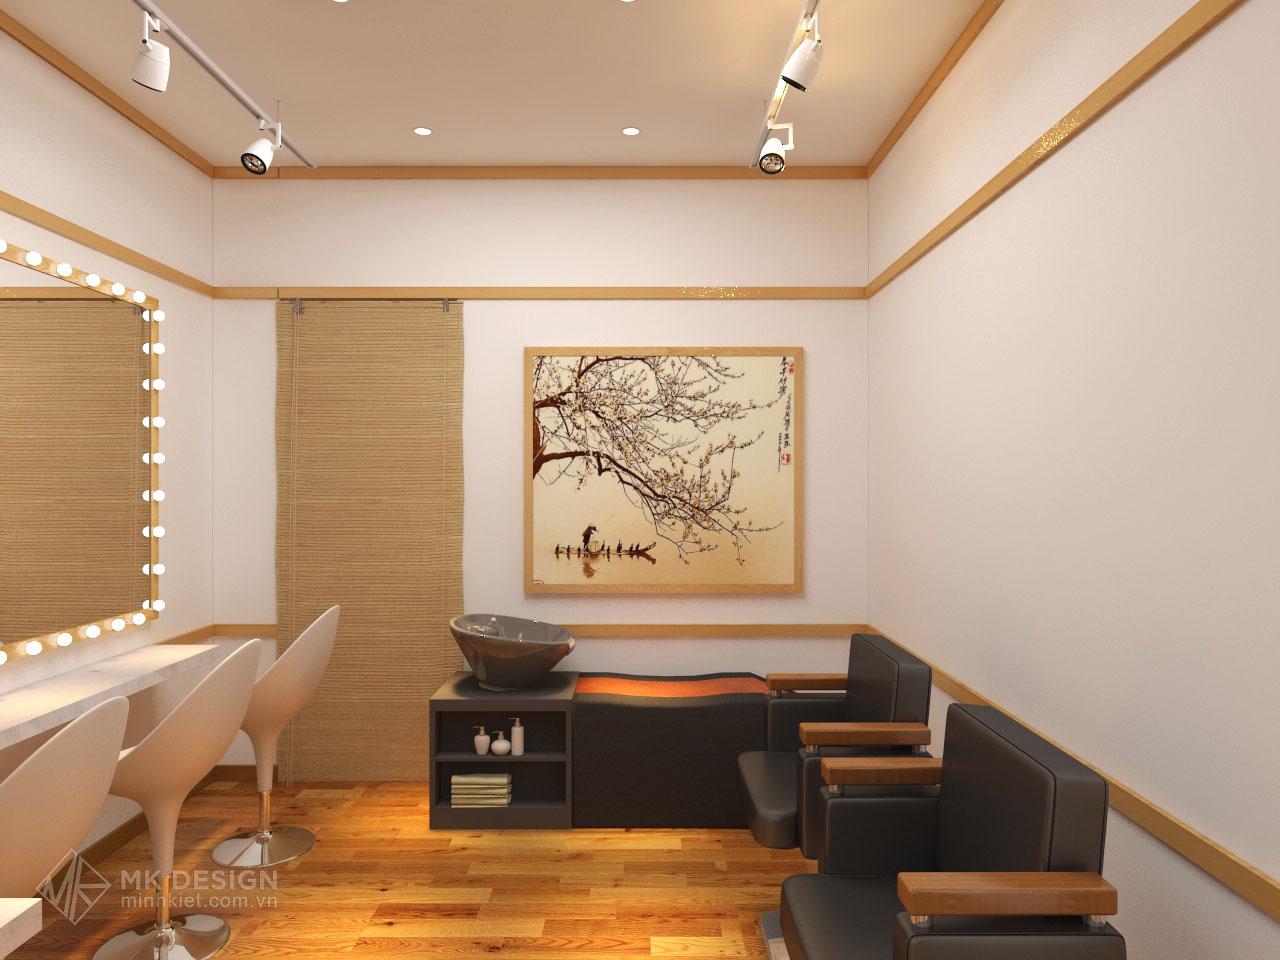 spa-momo-nhat-ban-Minh-Kiet-Design05